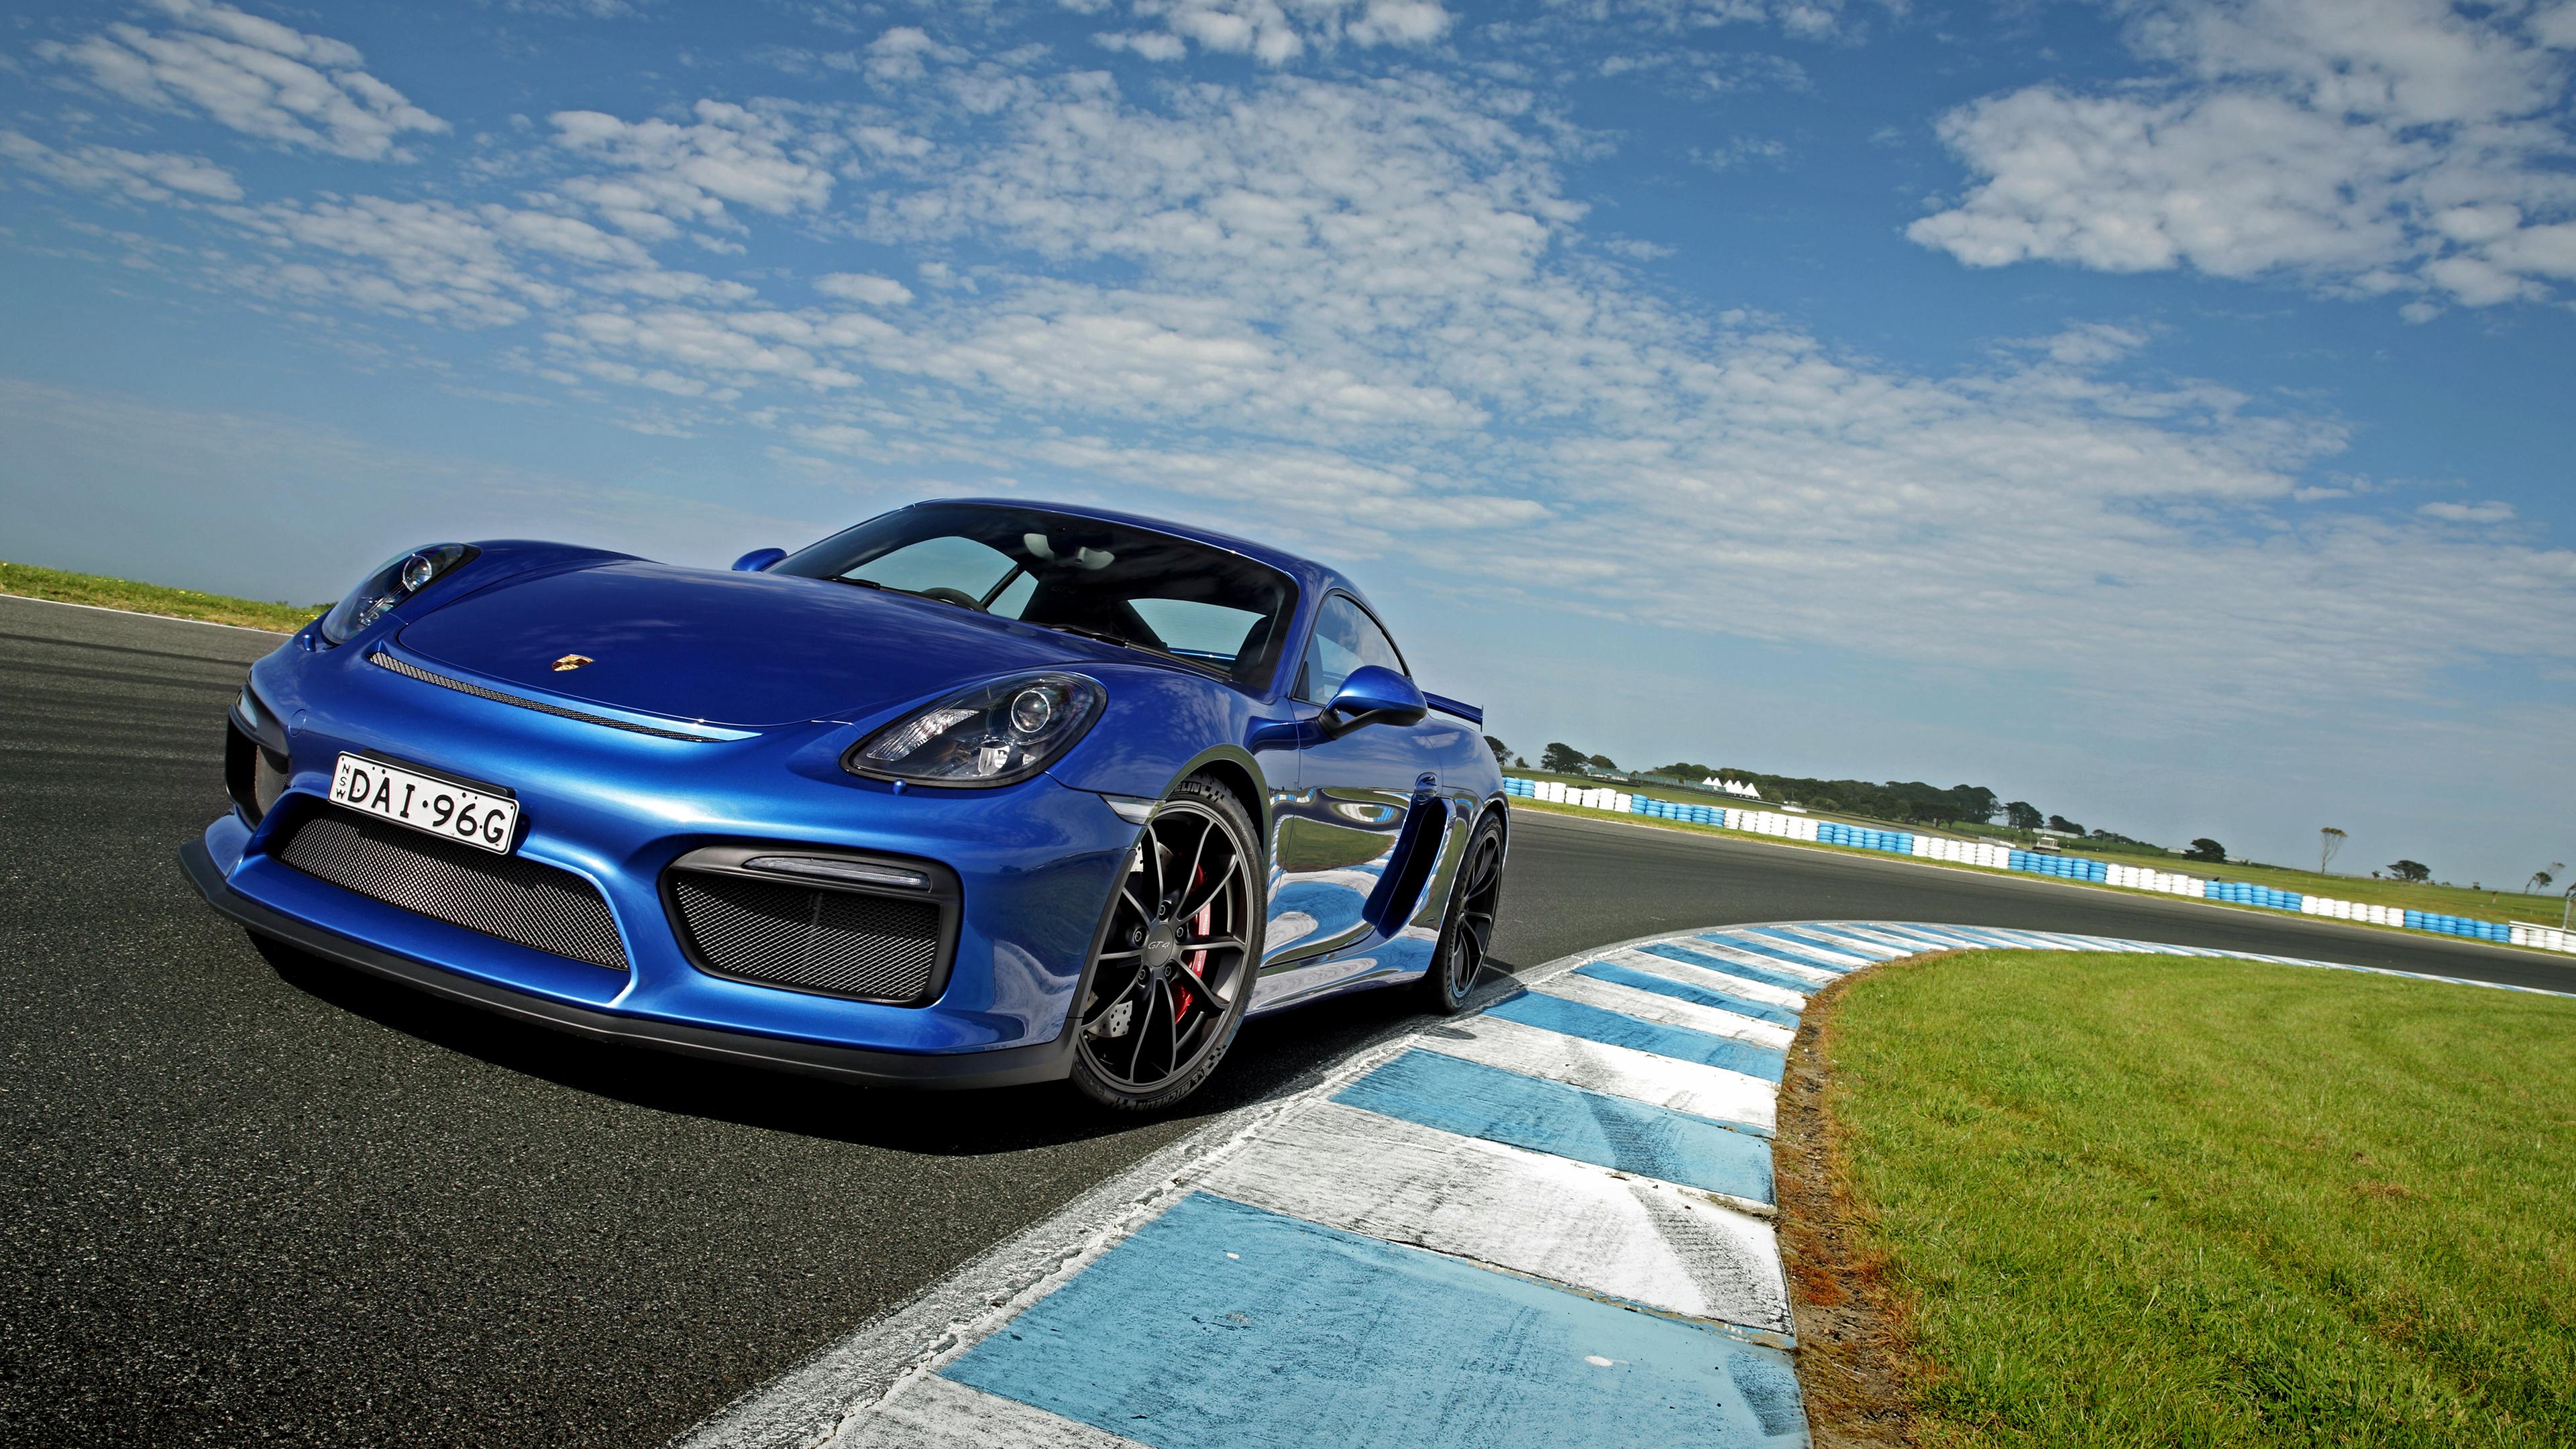 porsche cayman gt4 blue 1539104517 - Porsche Cayman GT4 Blue - porsche wallpapers, porsche cayman wallpapers, cars wallpapers